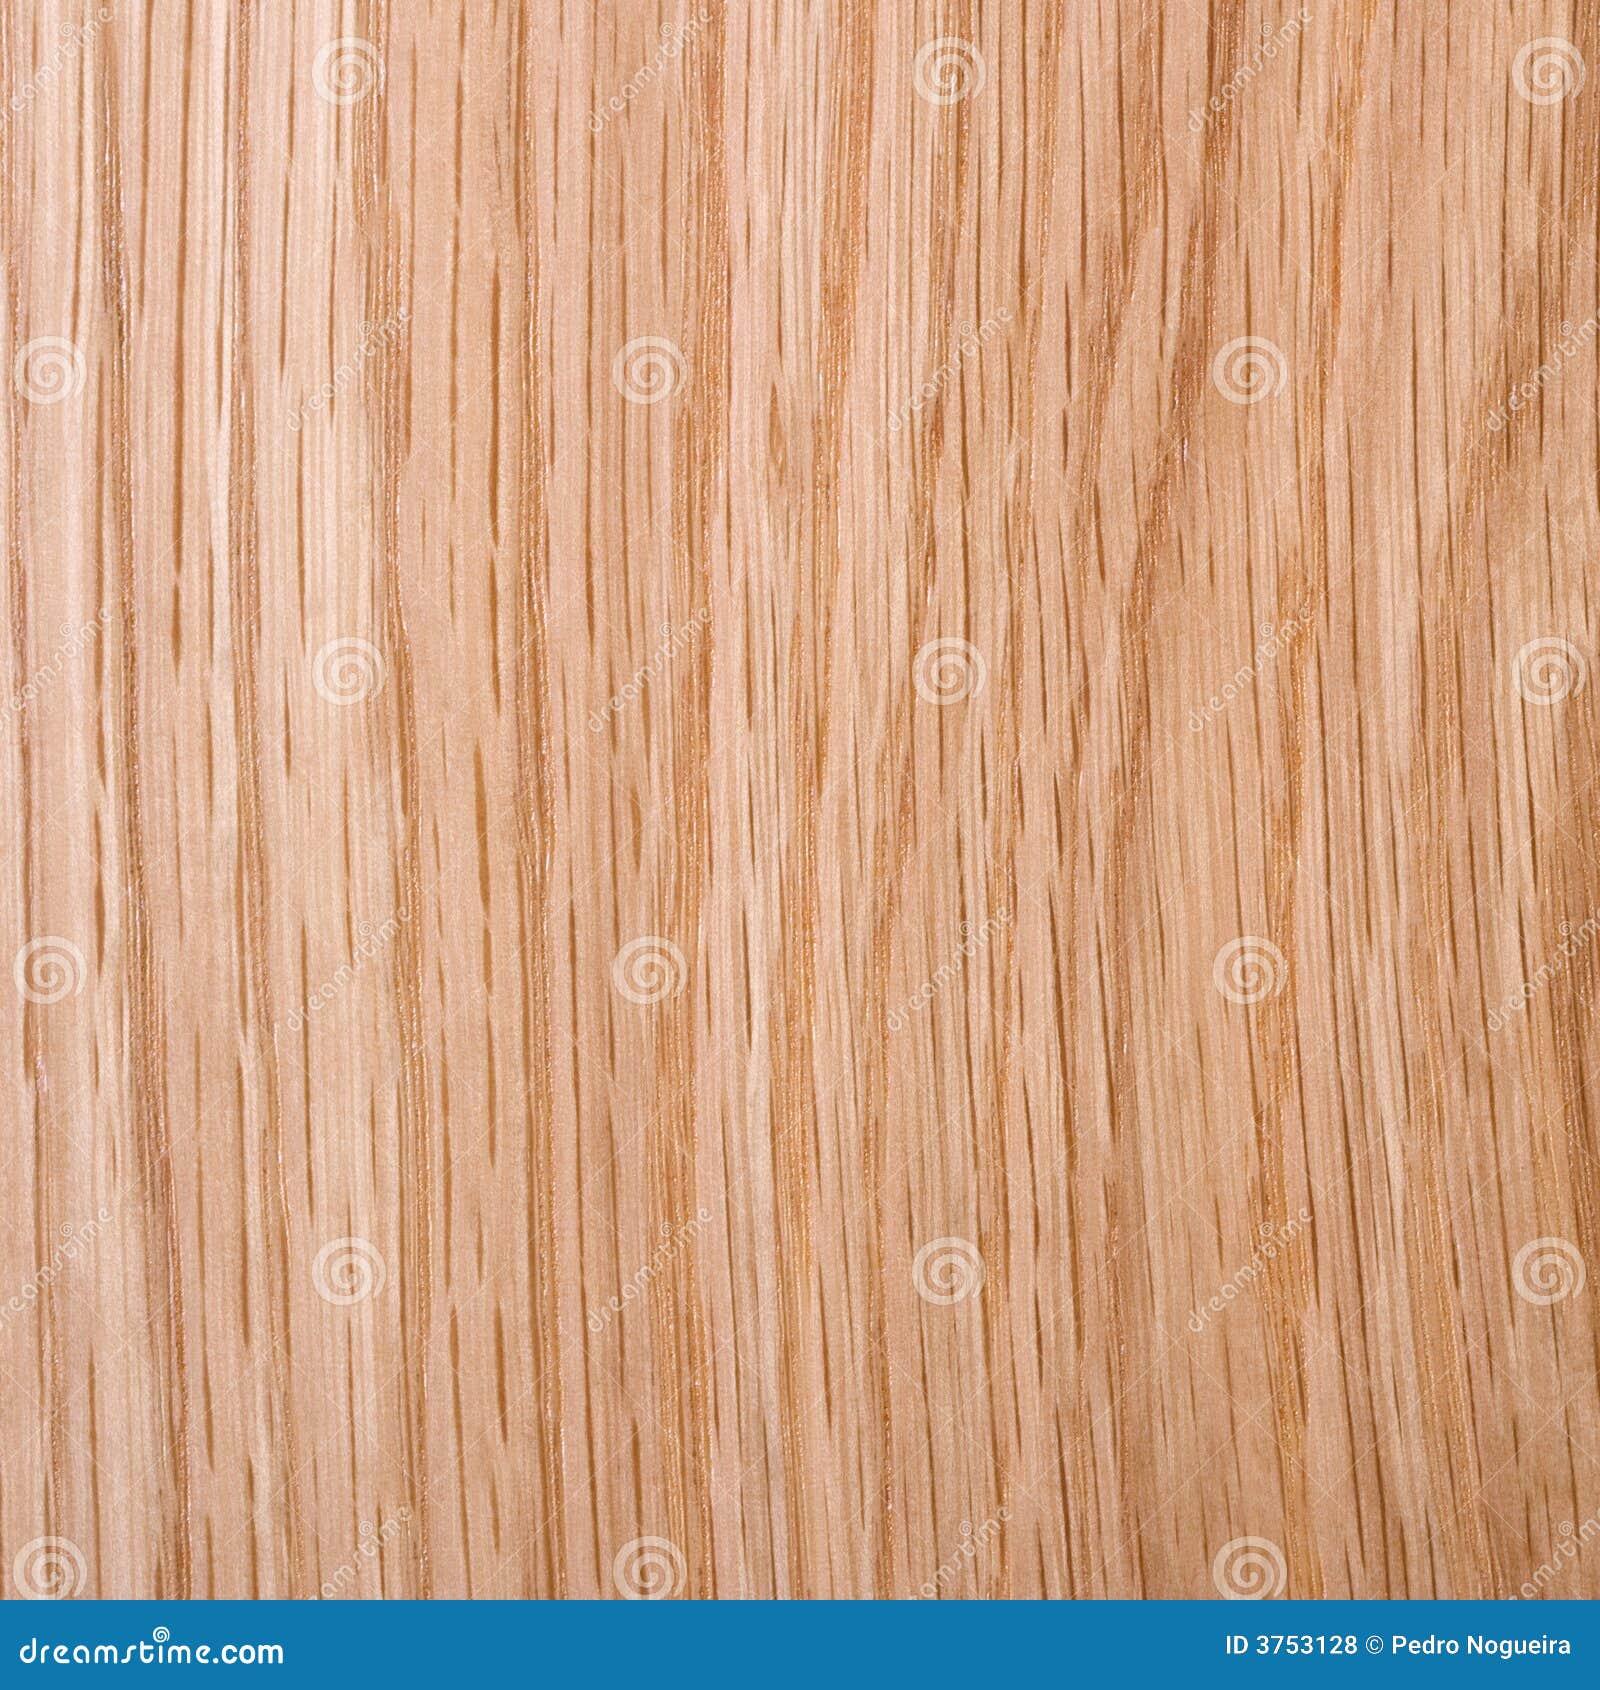 Light brown wood texture royalty free stock photos image for Legno chiaro texture